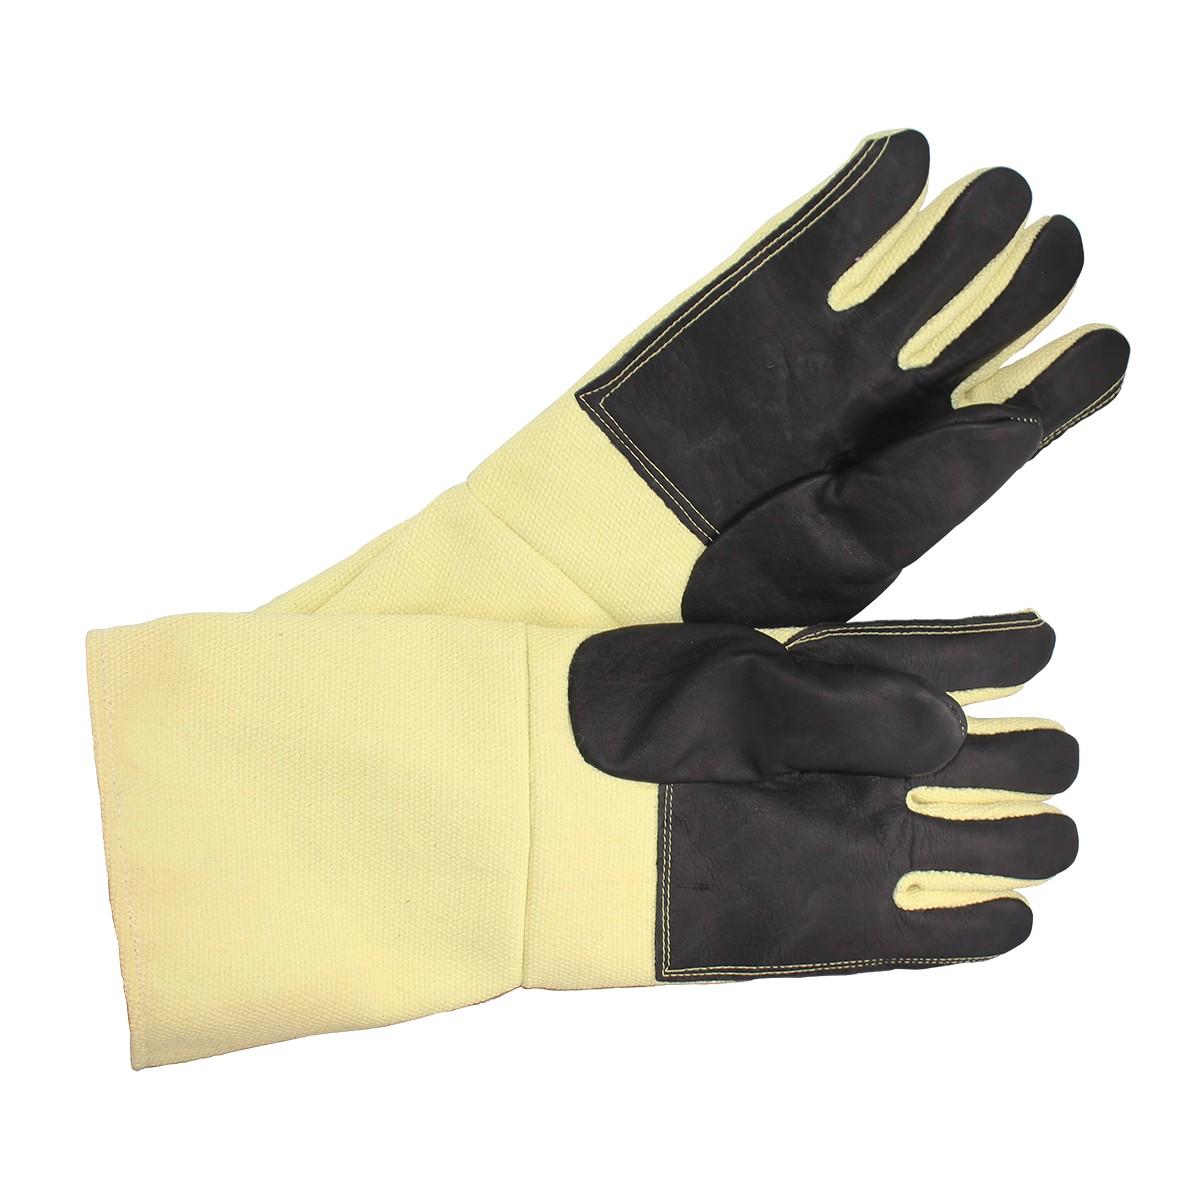 "18"" Yellow Non-Asbestos Leather Palm Gloves Pair"